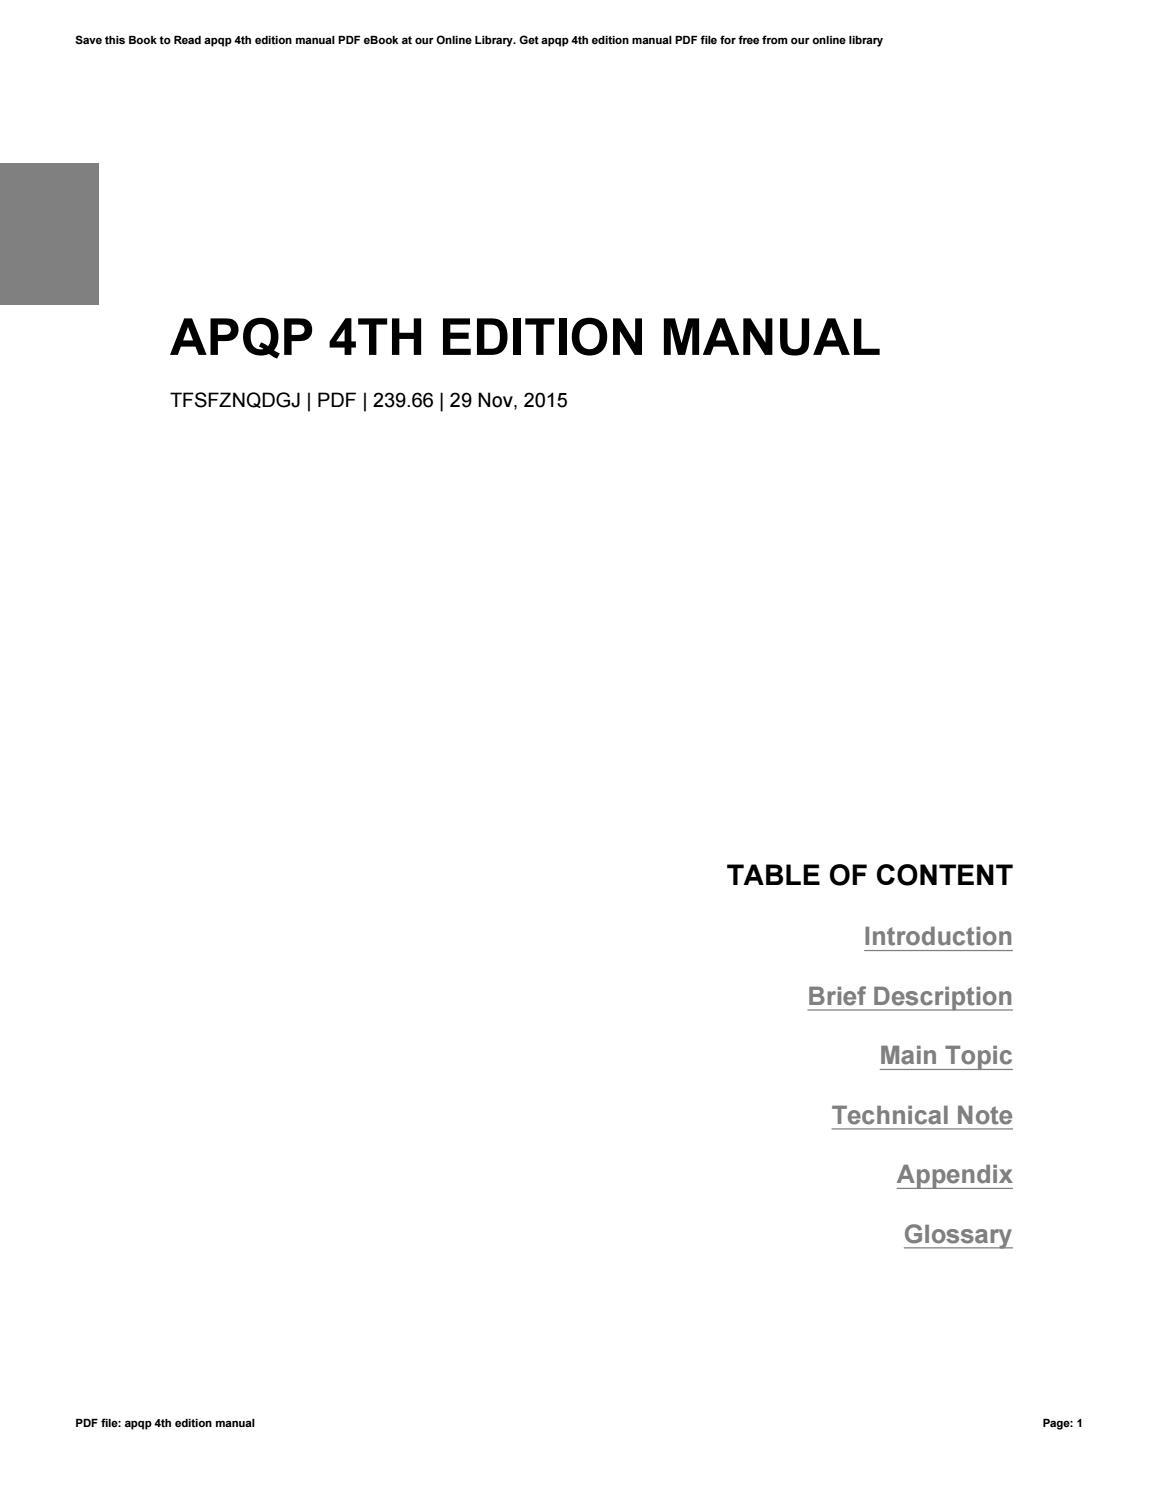 Download free aiag apqp manual 4th edition allstarfreeware.